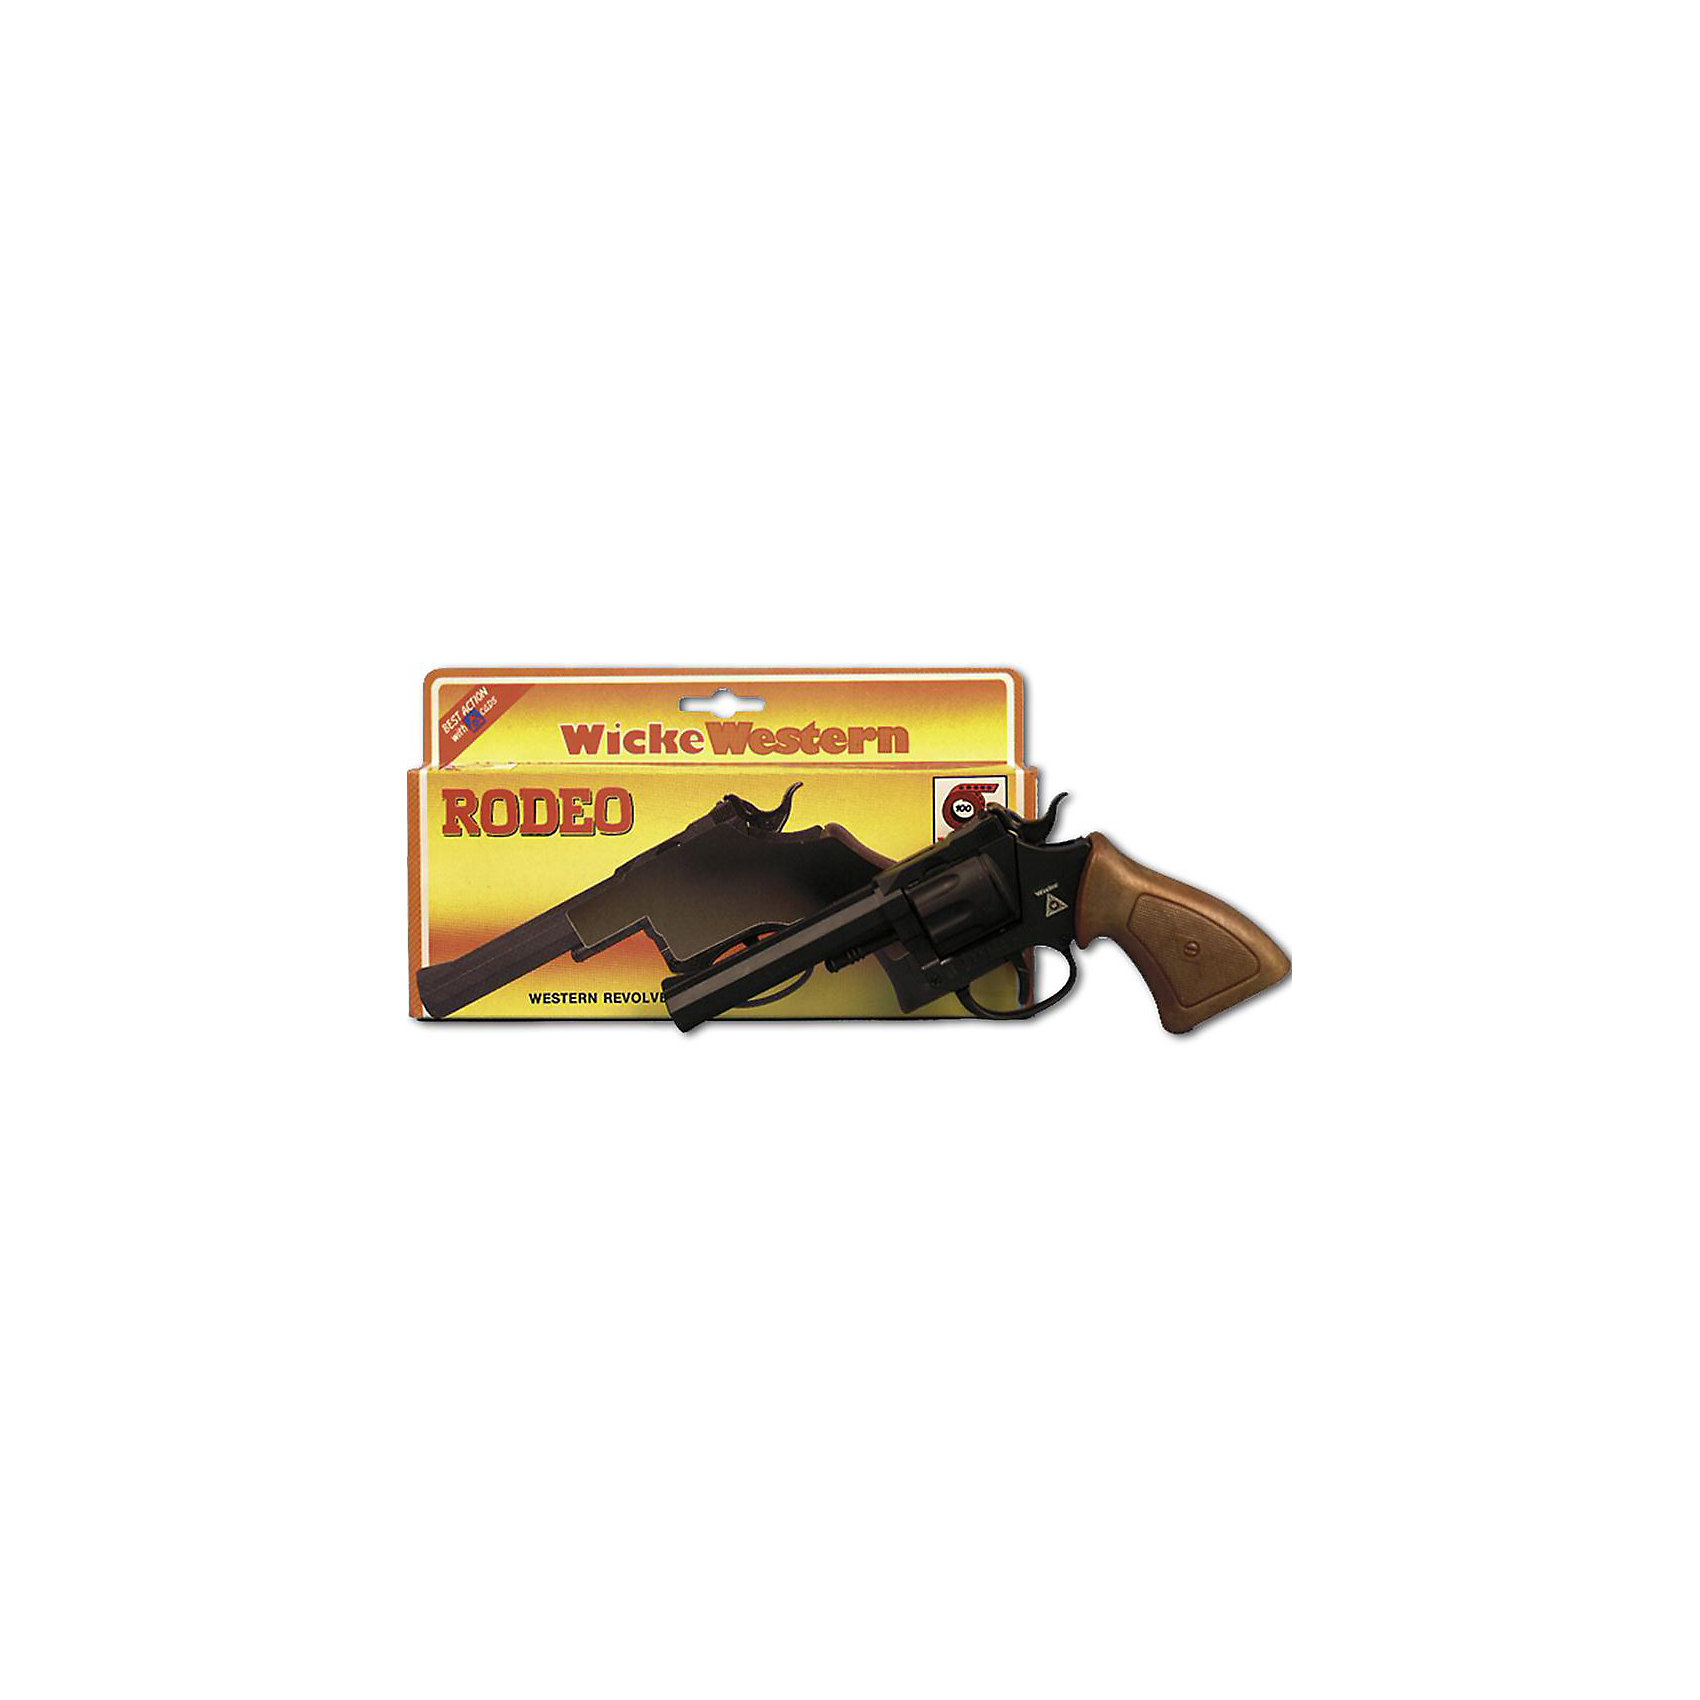 Пистолет Rodeo, 100-зарядный,  Sohni-Wicke Weco 1542096